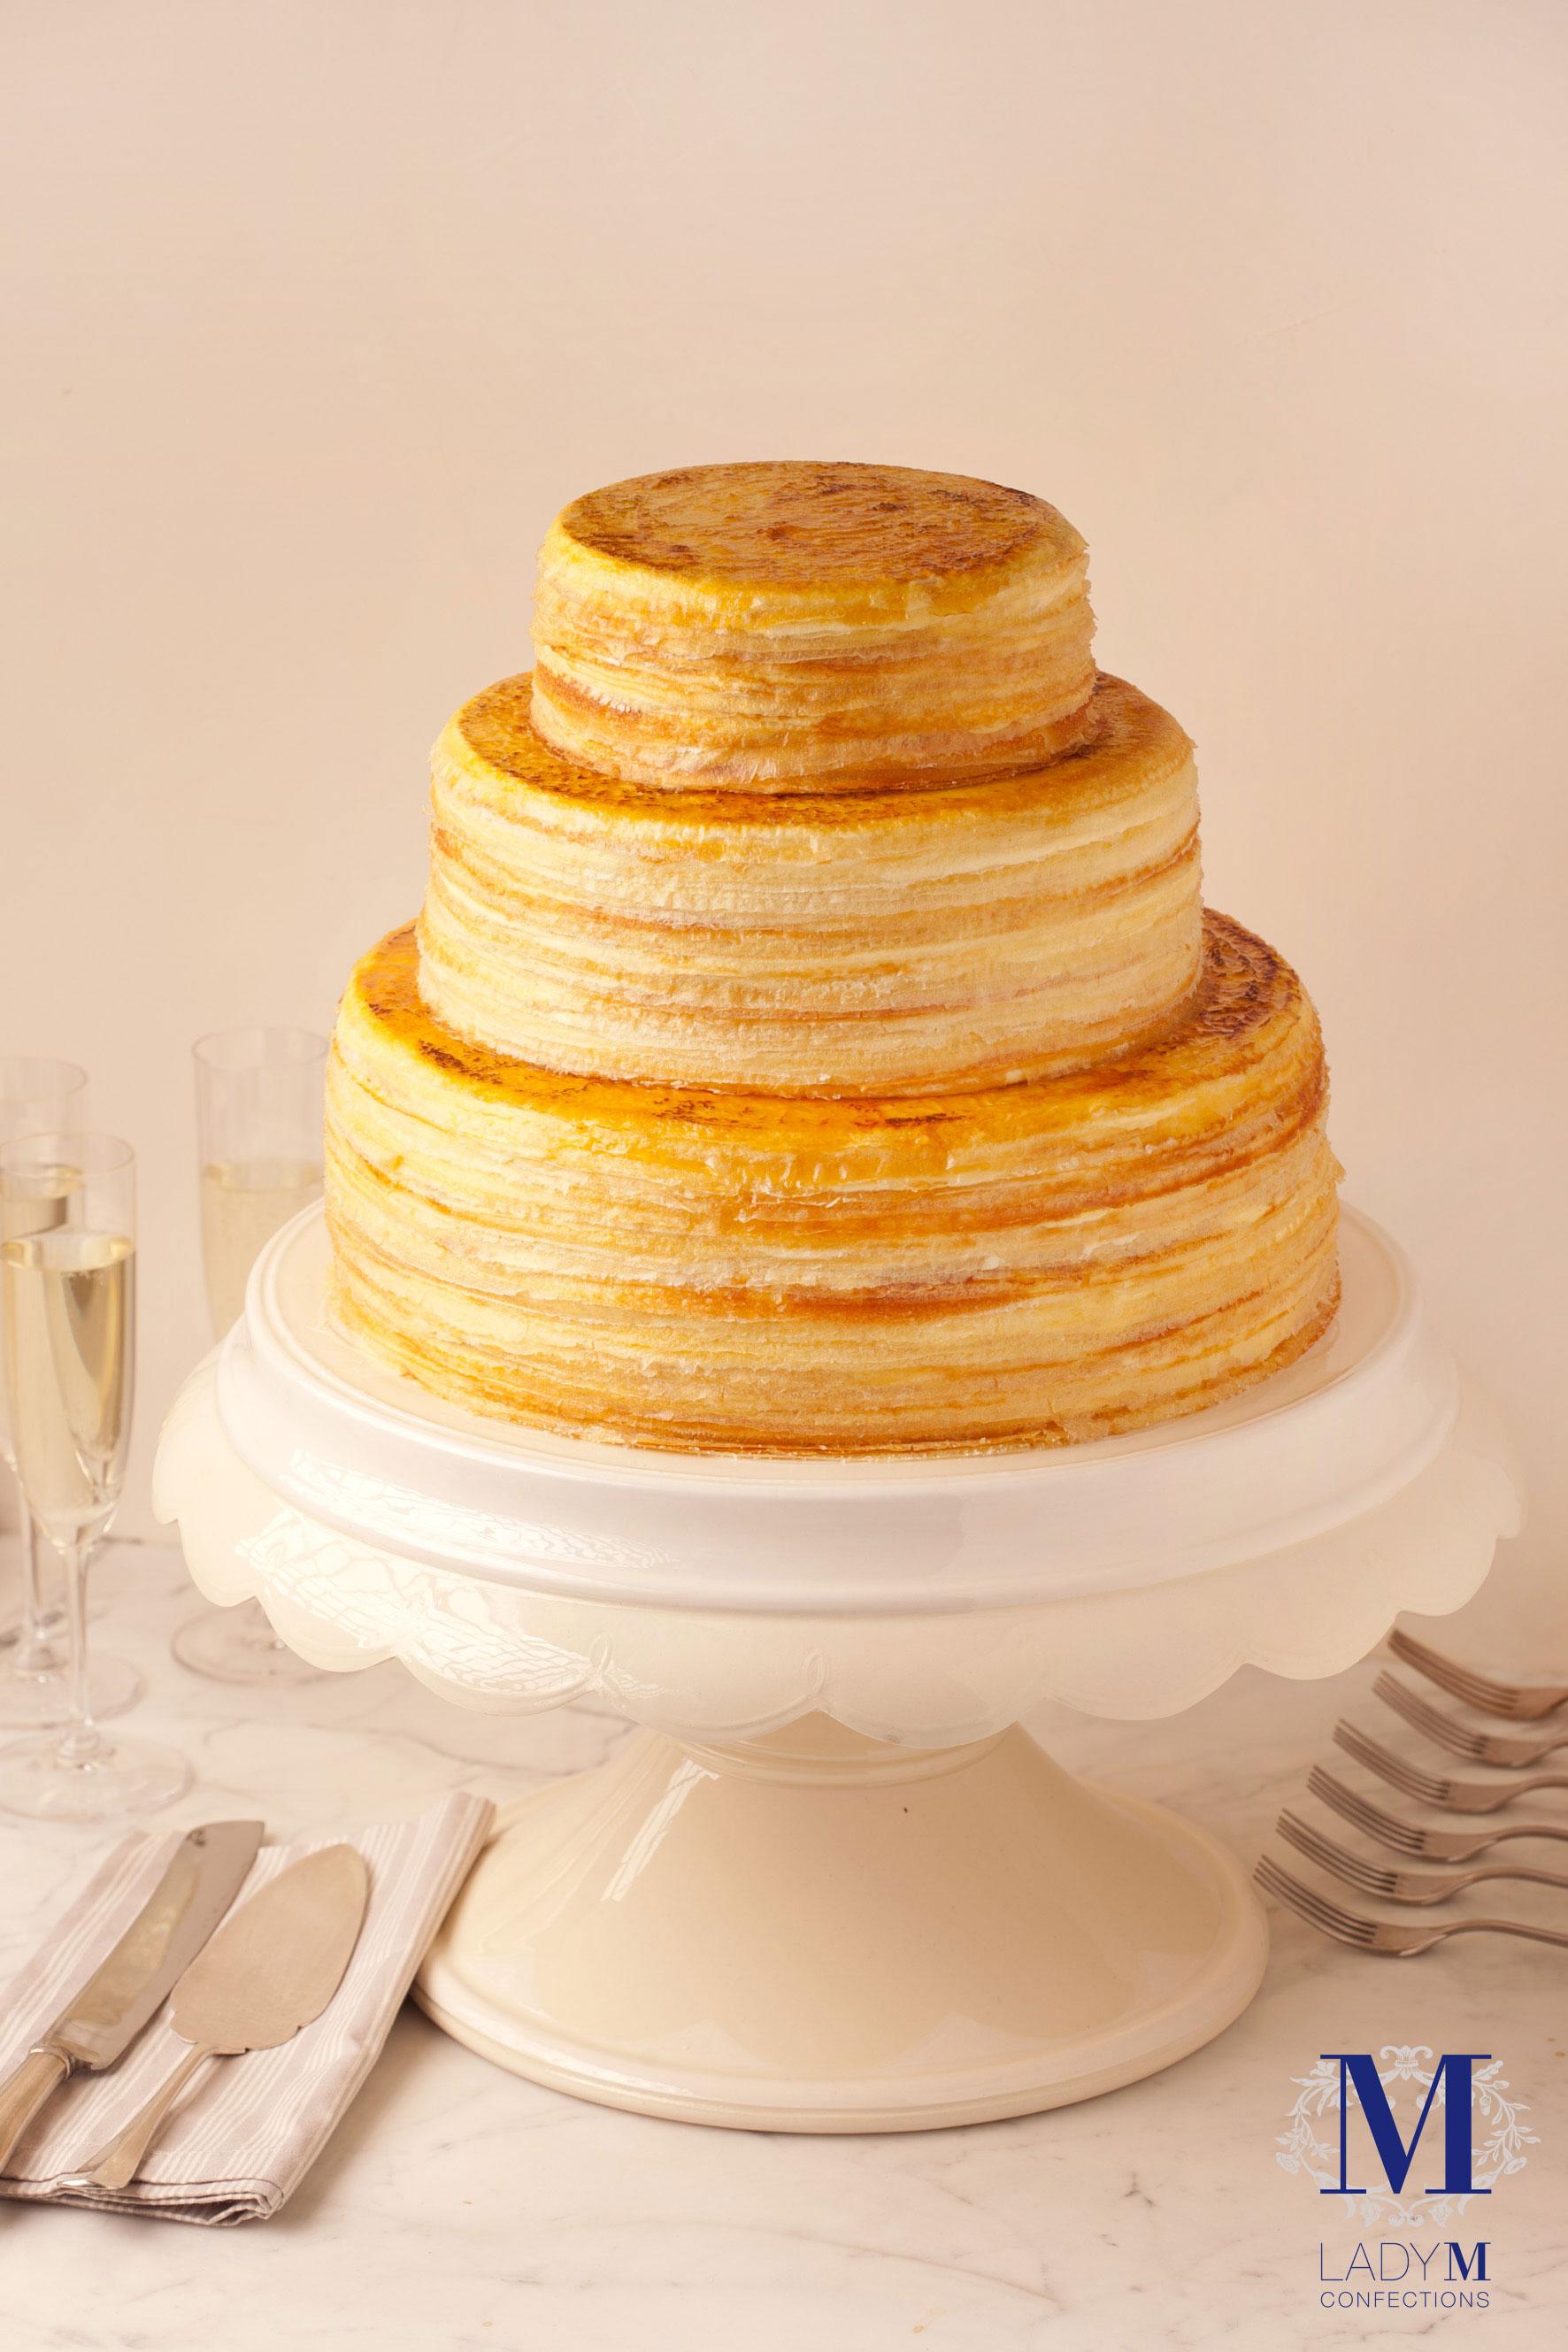 Lady M® Confections Singapore | Wedding Wedding Cake in Singapore ...